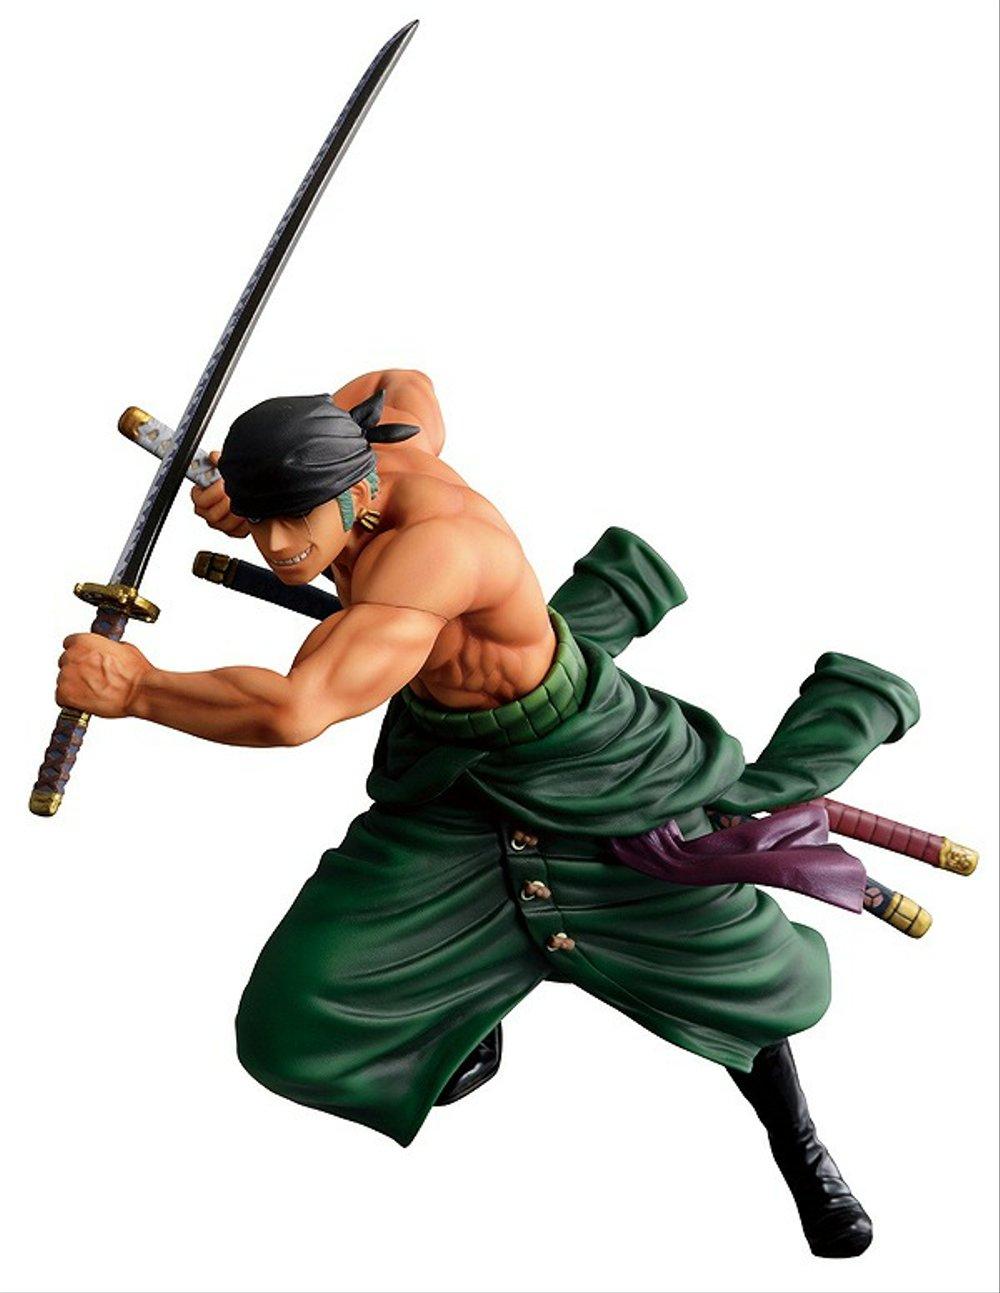 Roronoa Zoro Figure, Ichiban Kuji B Prize, One Piece, Banpresto